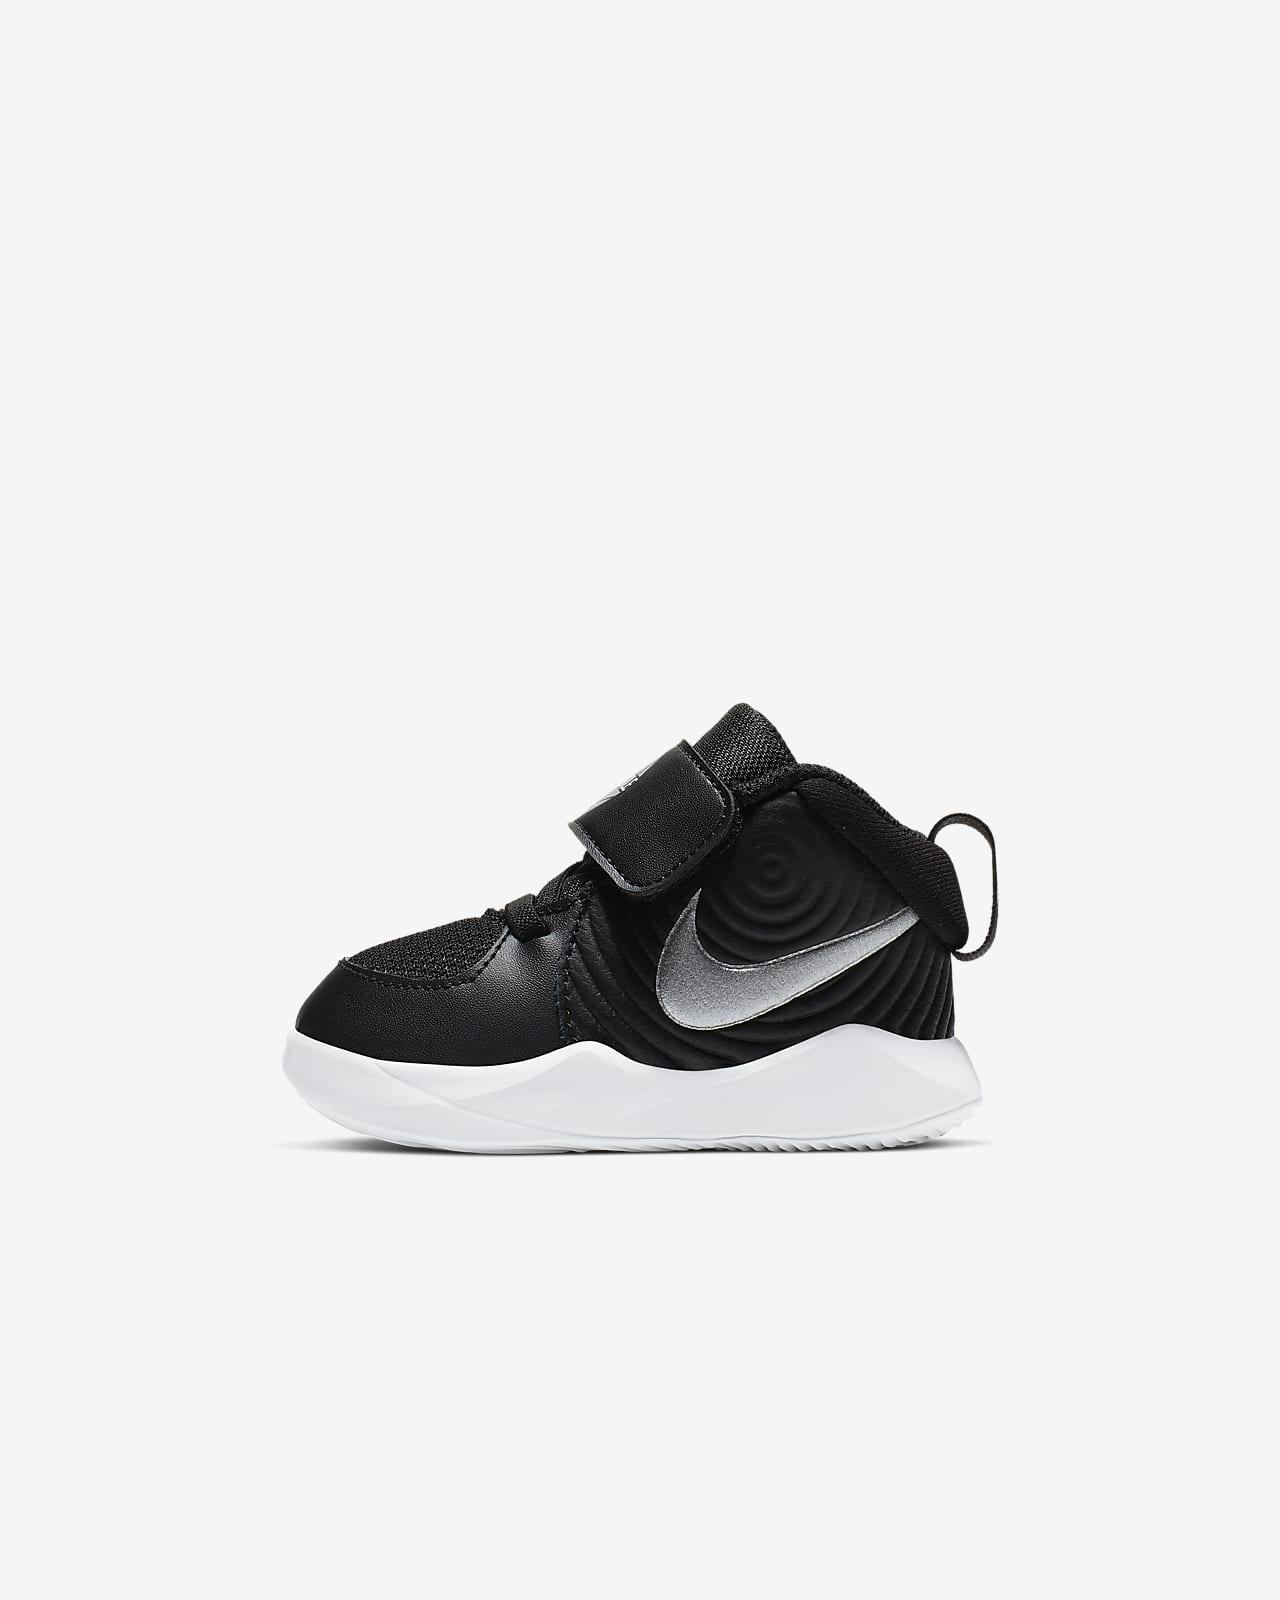 Nike Team Hustle D 9 Baby & Toddler Shoe